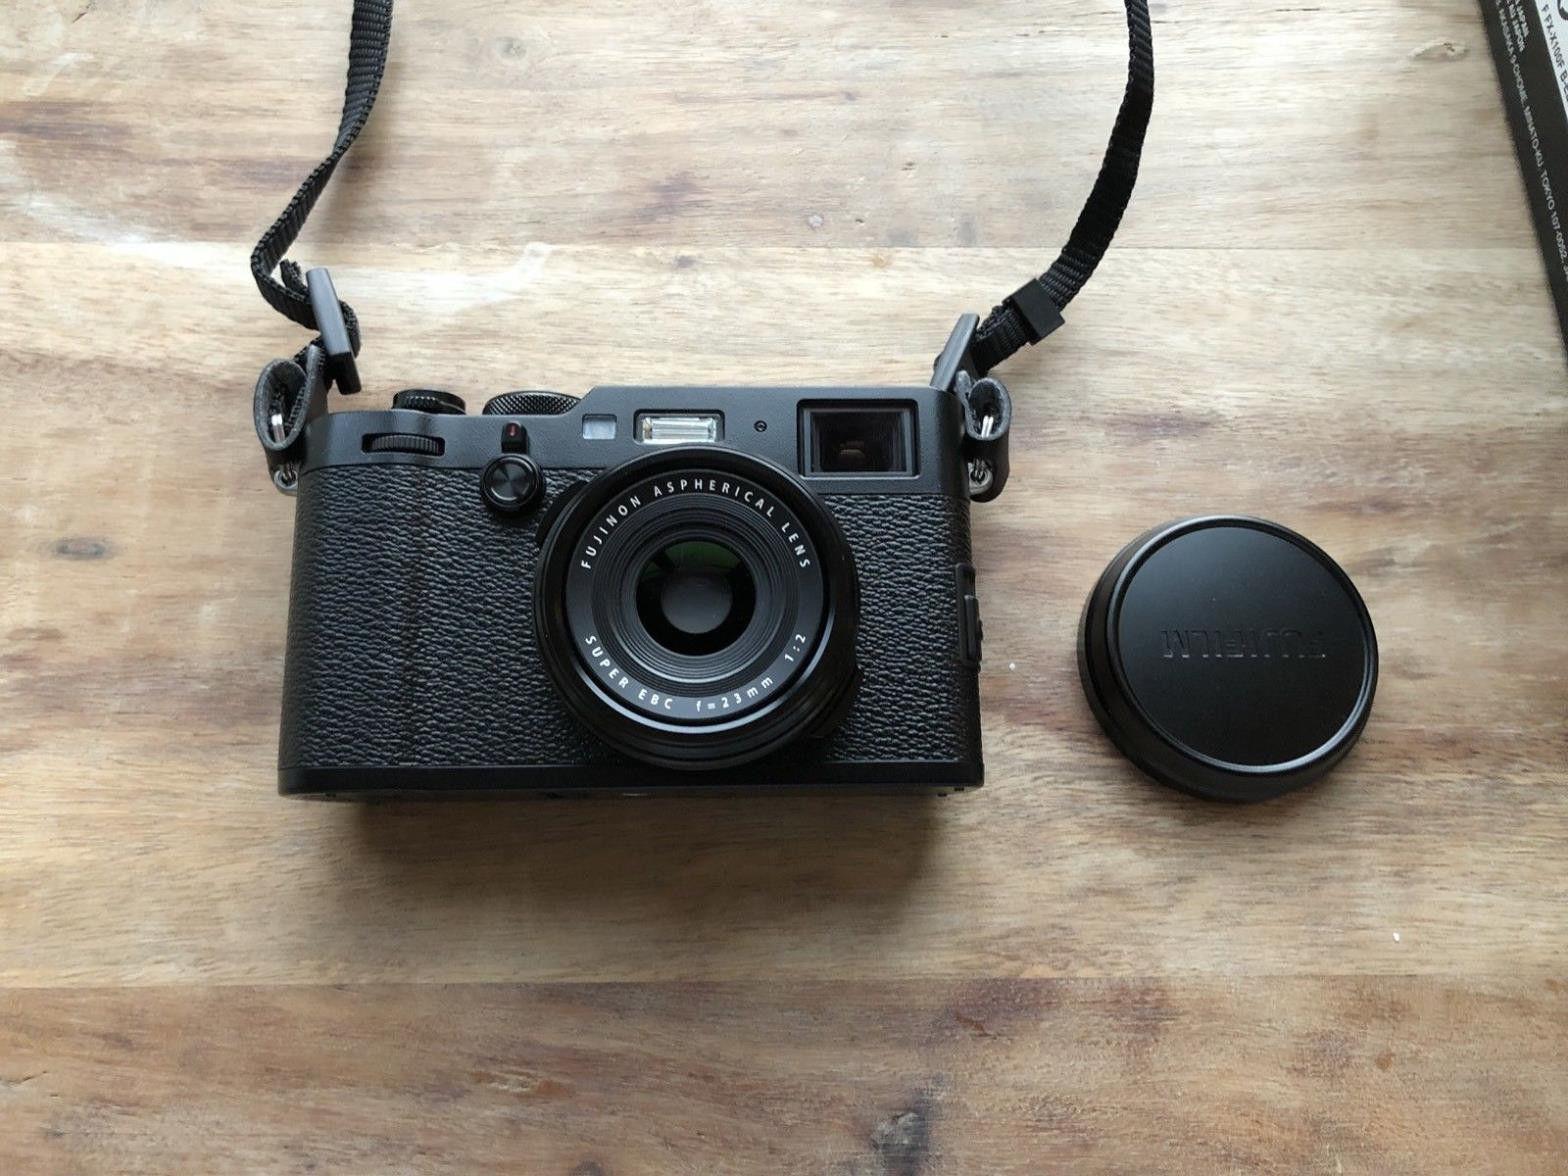 Fujifilm X100F schwarz - OVP fast unbenutzt